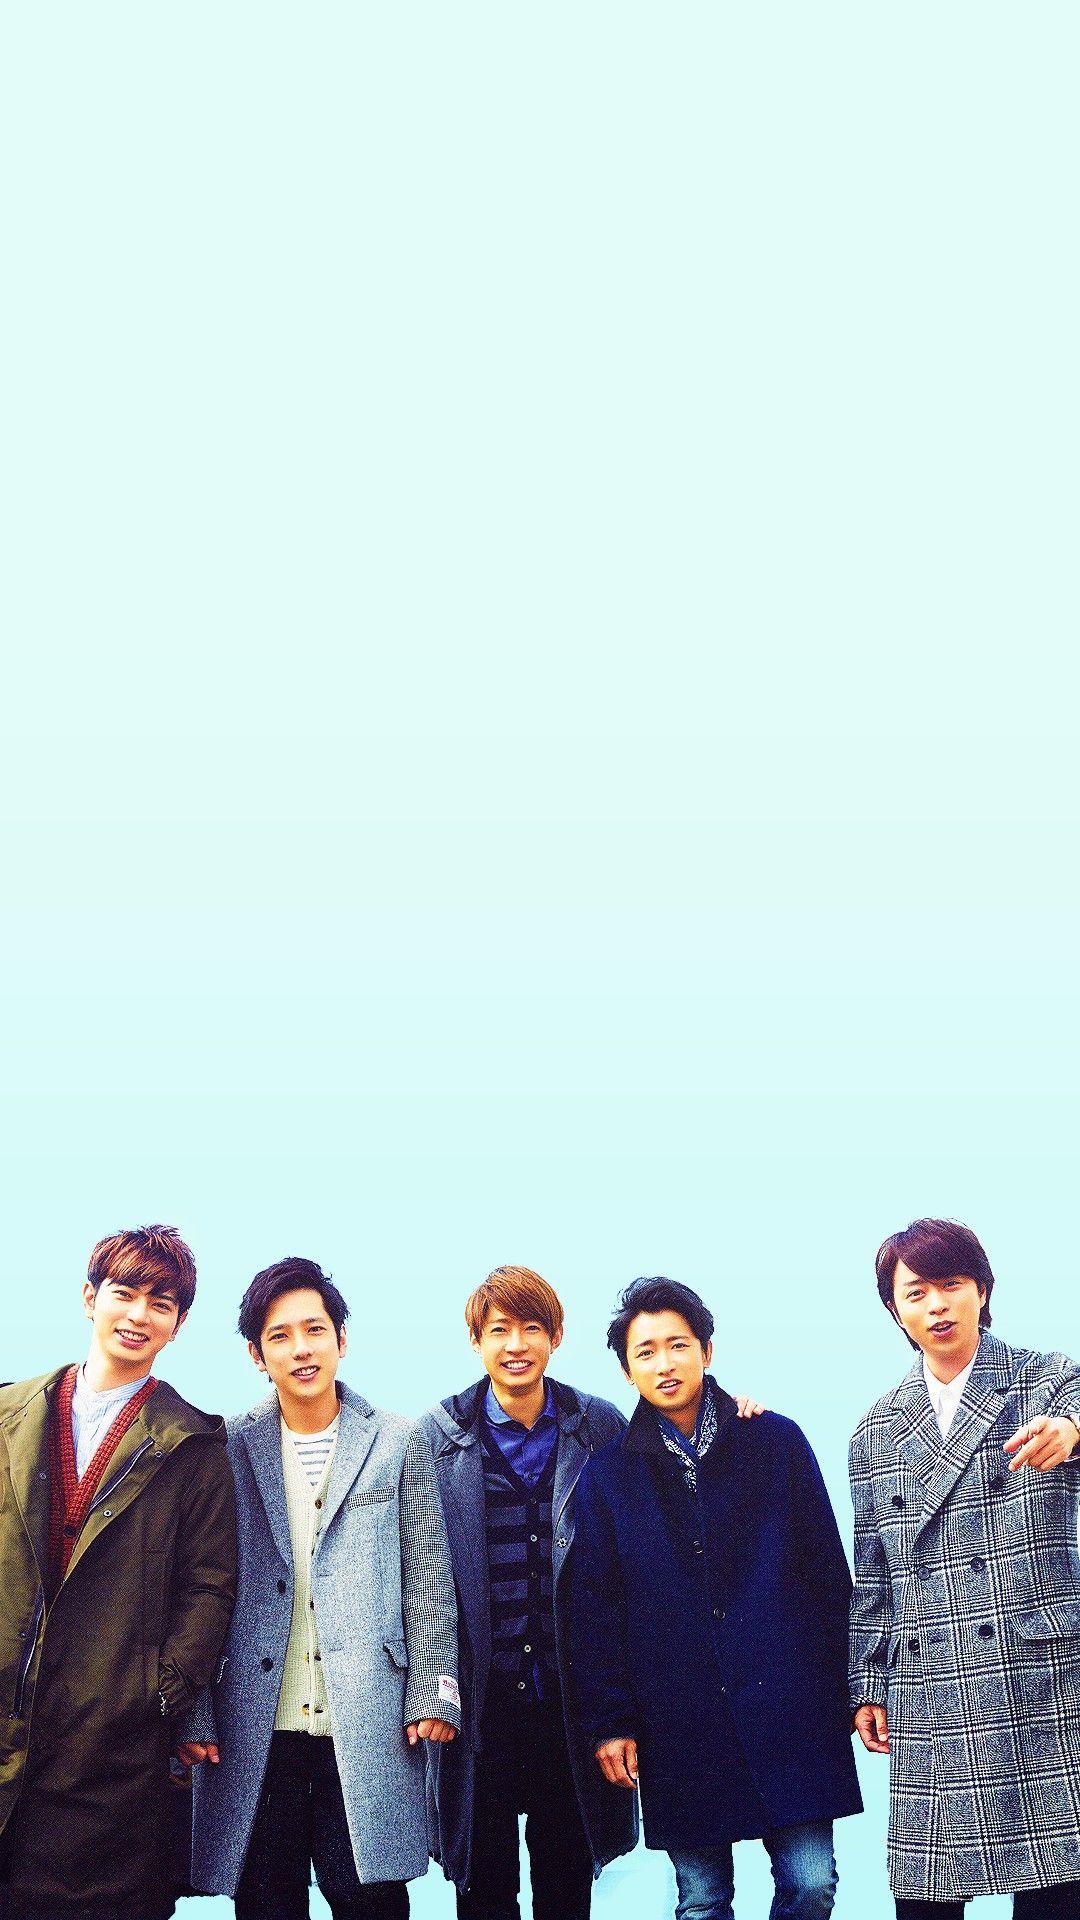 Arashi Wallpaper 嵐5人 嵐 Arashi 嵐